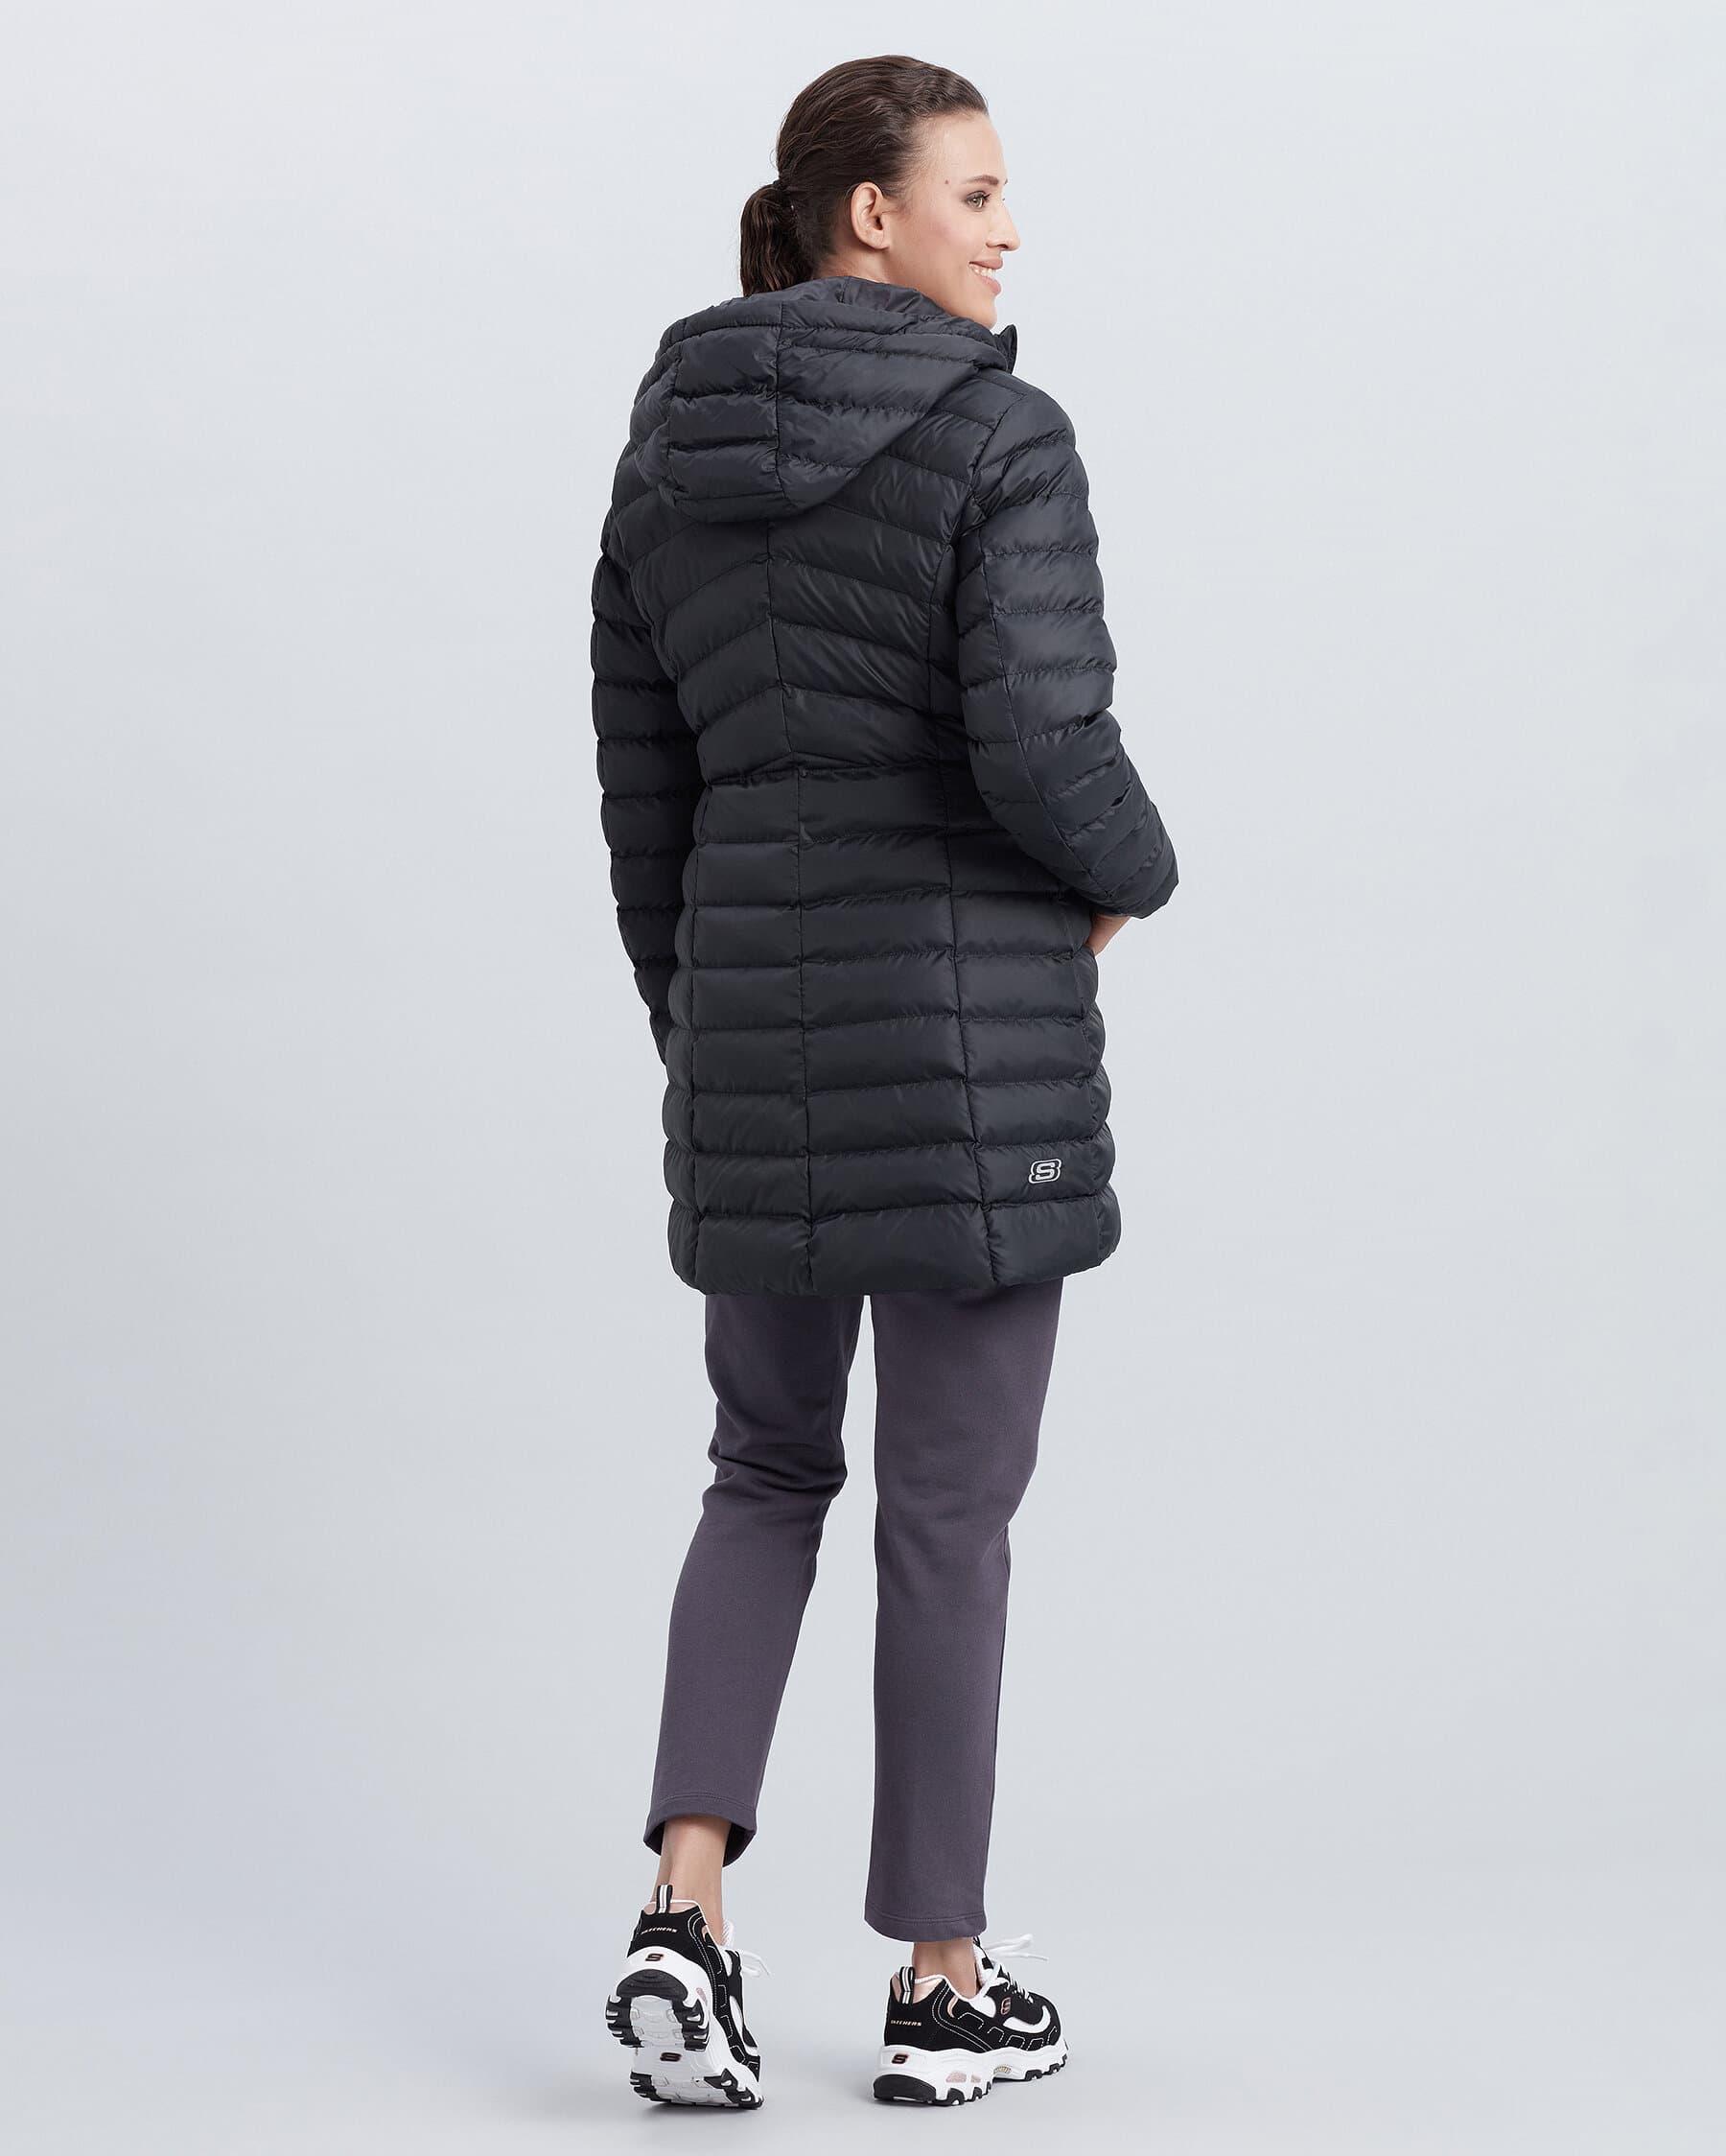 Essentil Kadın Siyah Uzun Boy Mont (S212262-620)